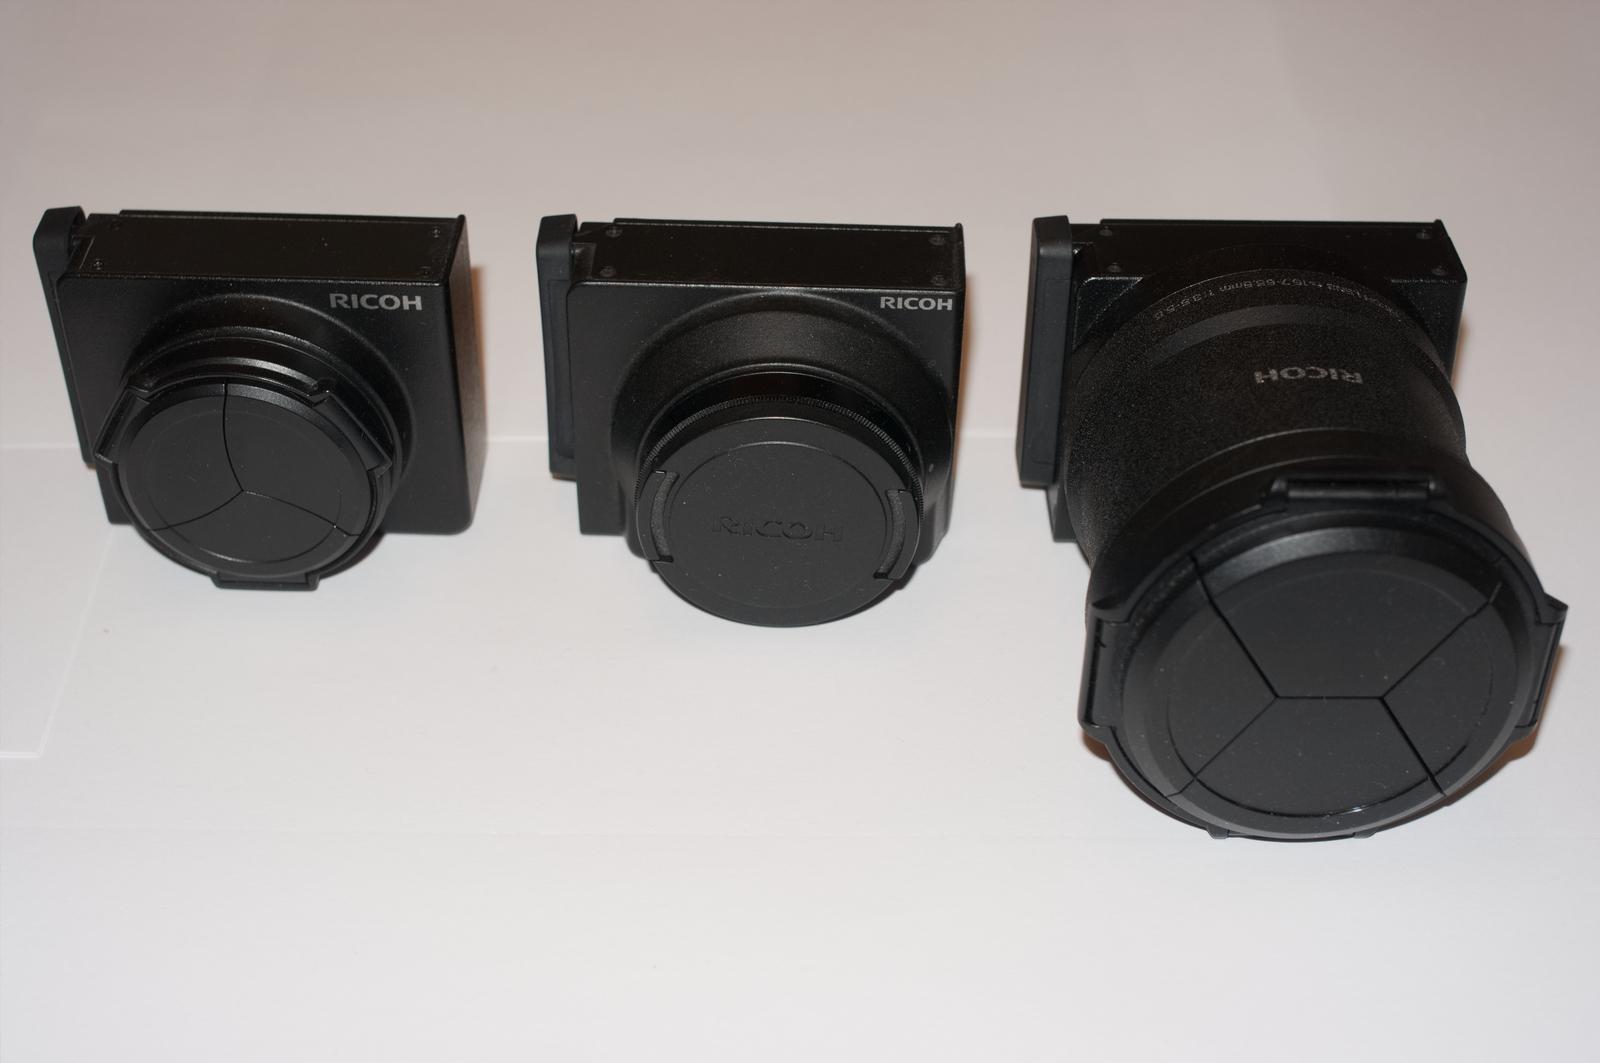 Driver for Ricoh GXR (GR LENS A12 28mm/ GR LENS A12 50mm/ RICOH LENS S10/ RICOH LENS P10) Camera